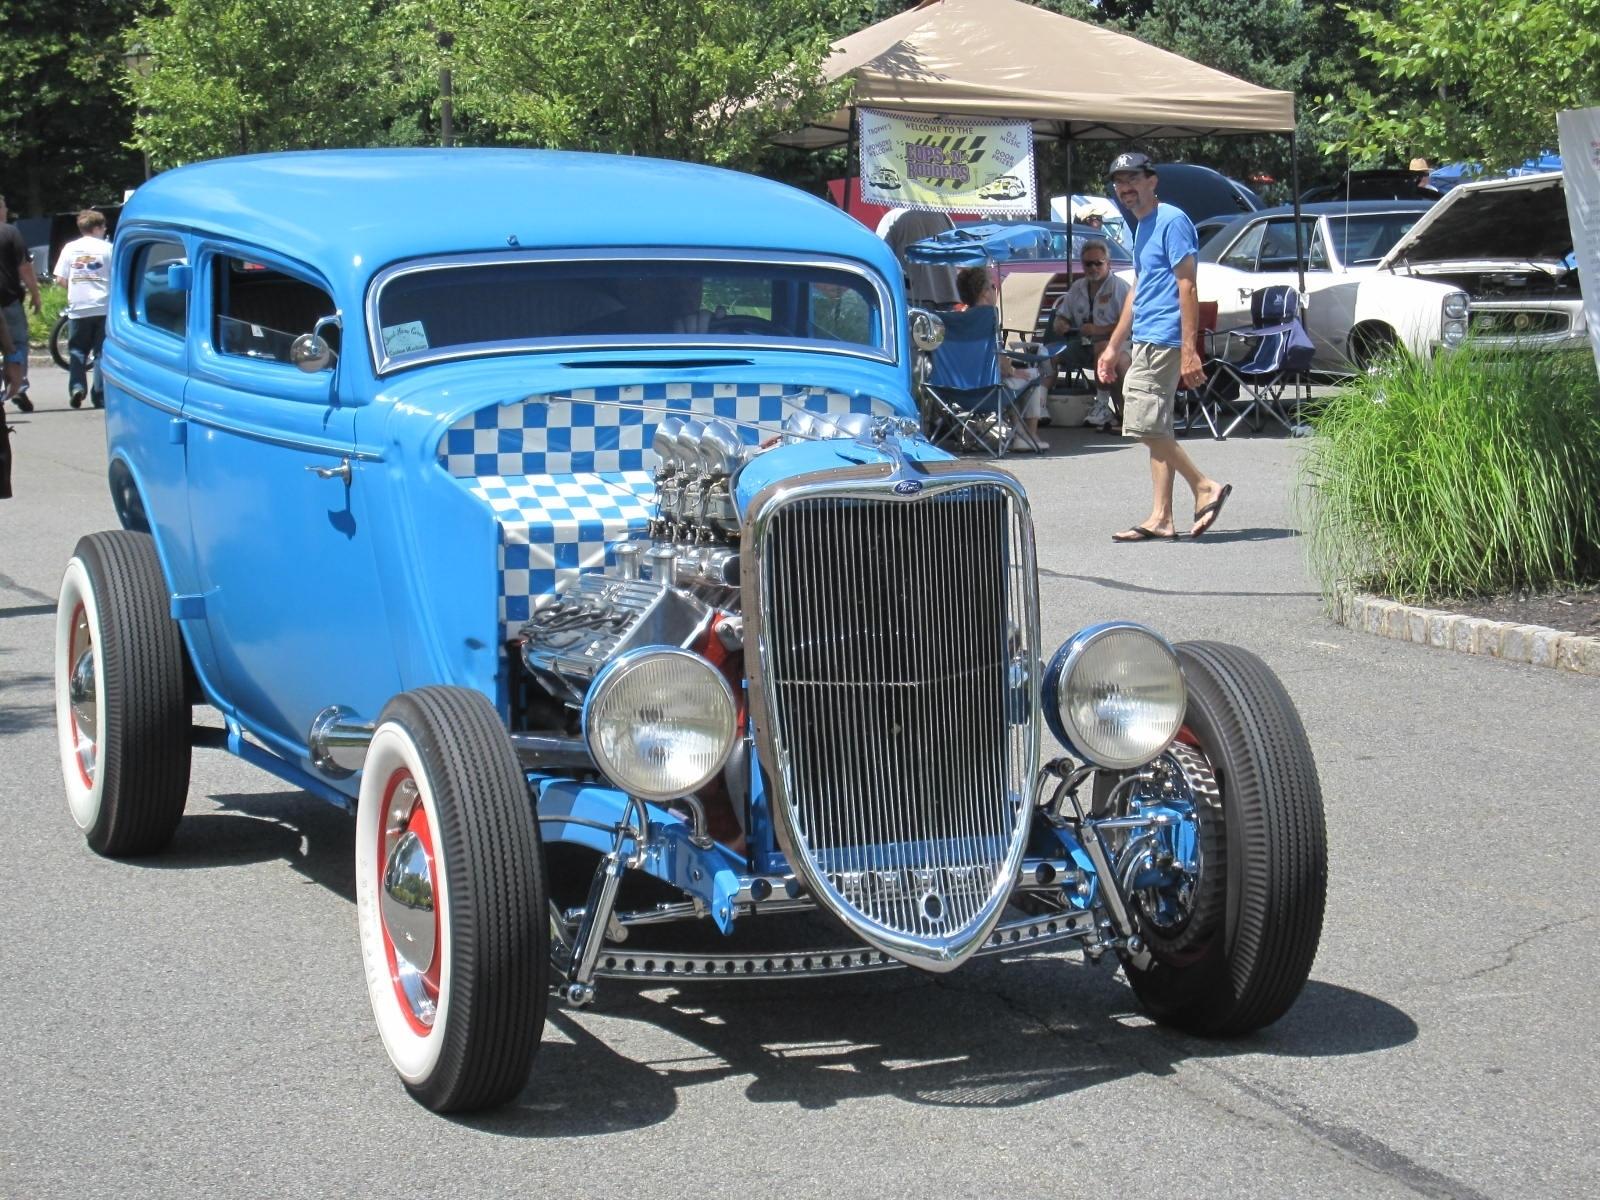 be966d709899ad8bddb3_classic_cars.JPG